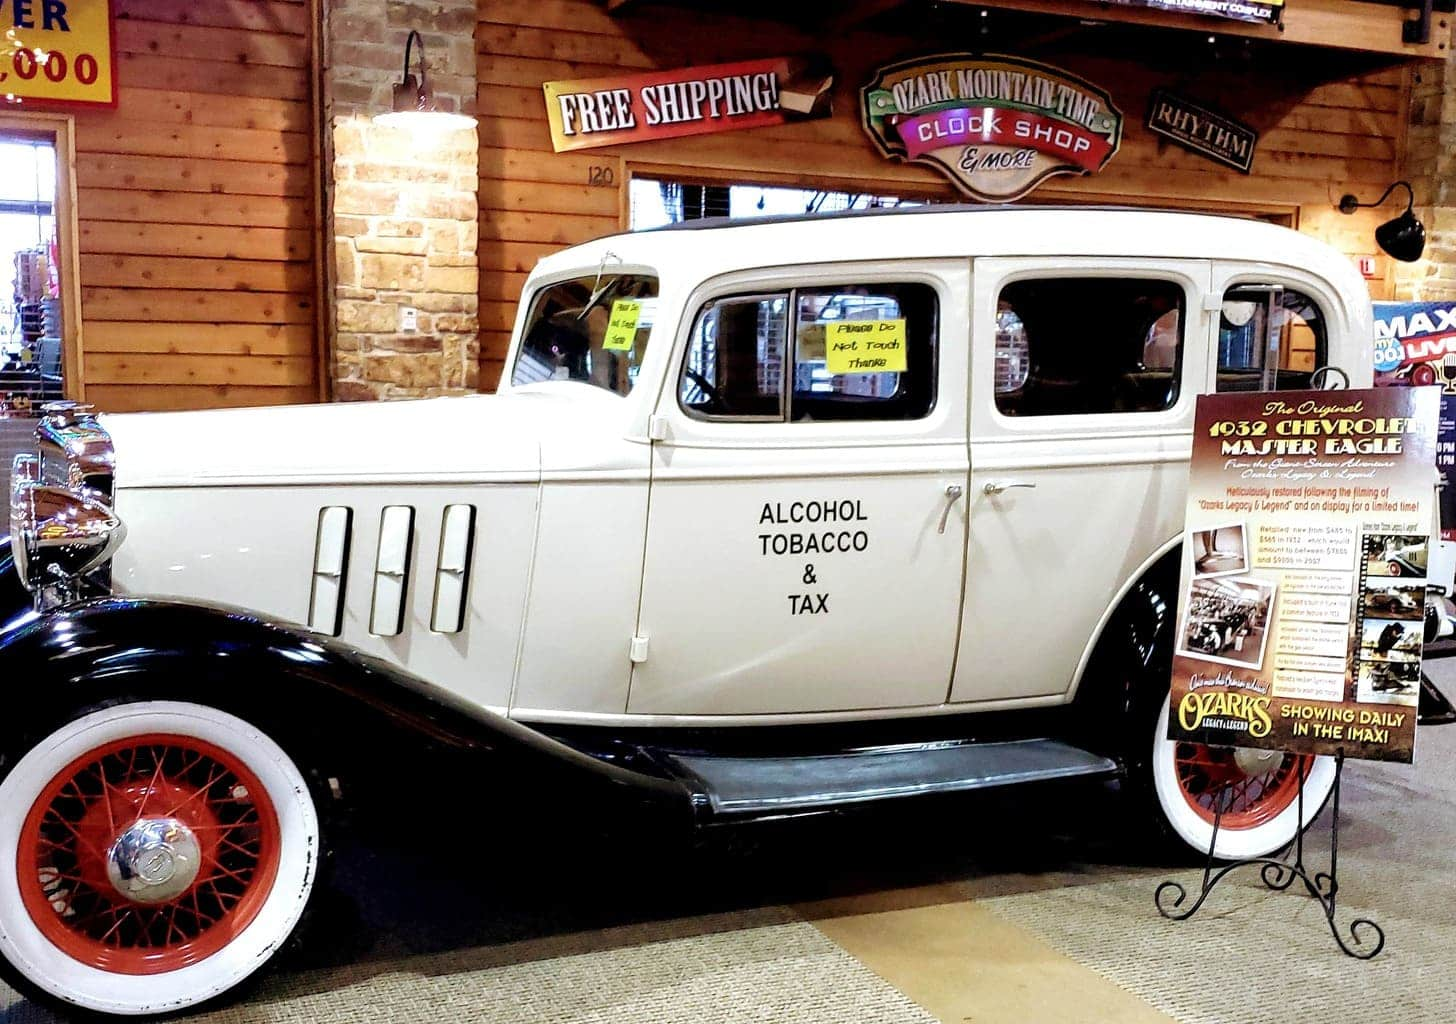 Chevrolet Master Eagle 1932, imax entertainment complex